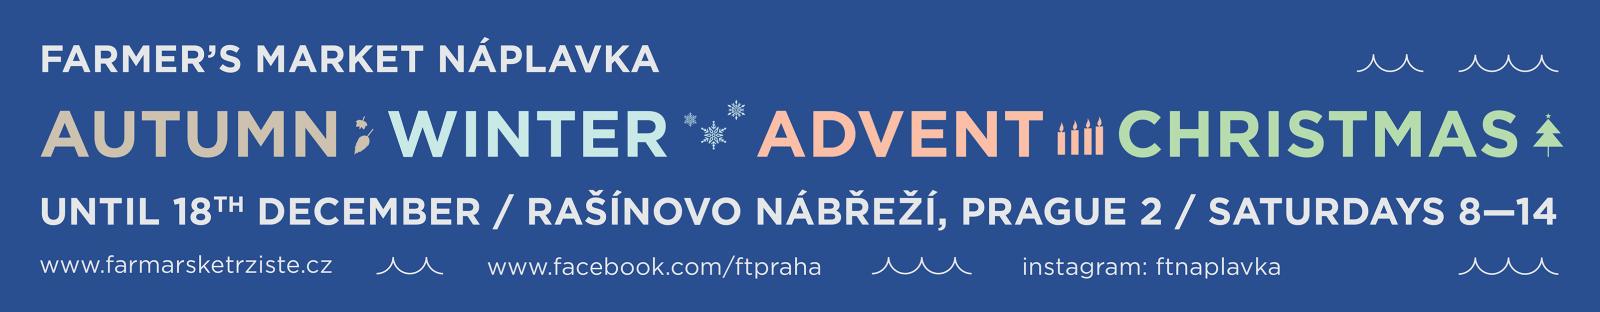 https://www.farmarsketrziste.cz/wp-content/uploads/naplavka-2021-web-770x150-v6c-aj.png